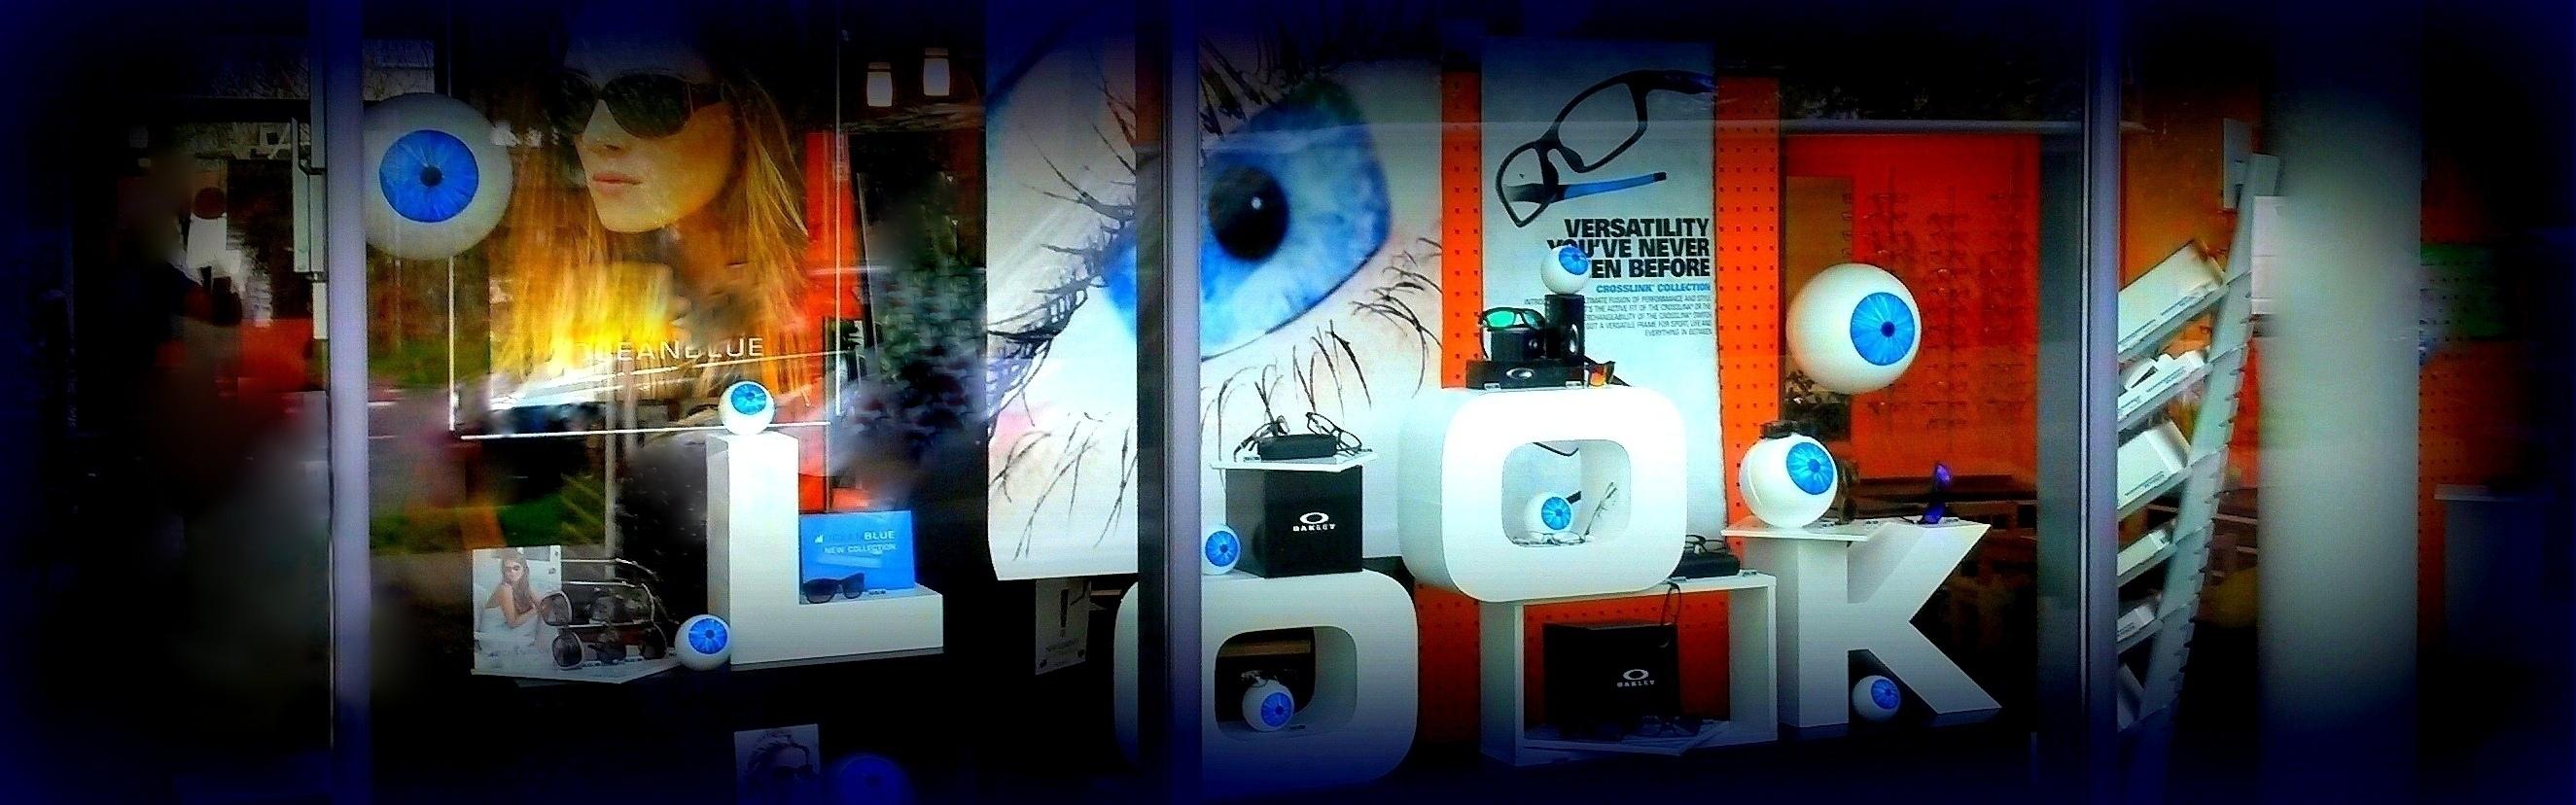 Schaufensterdekoration - Optiker